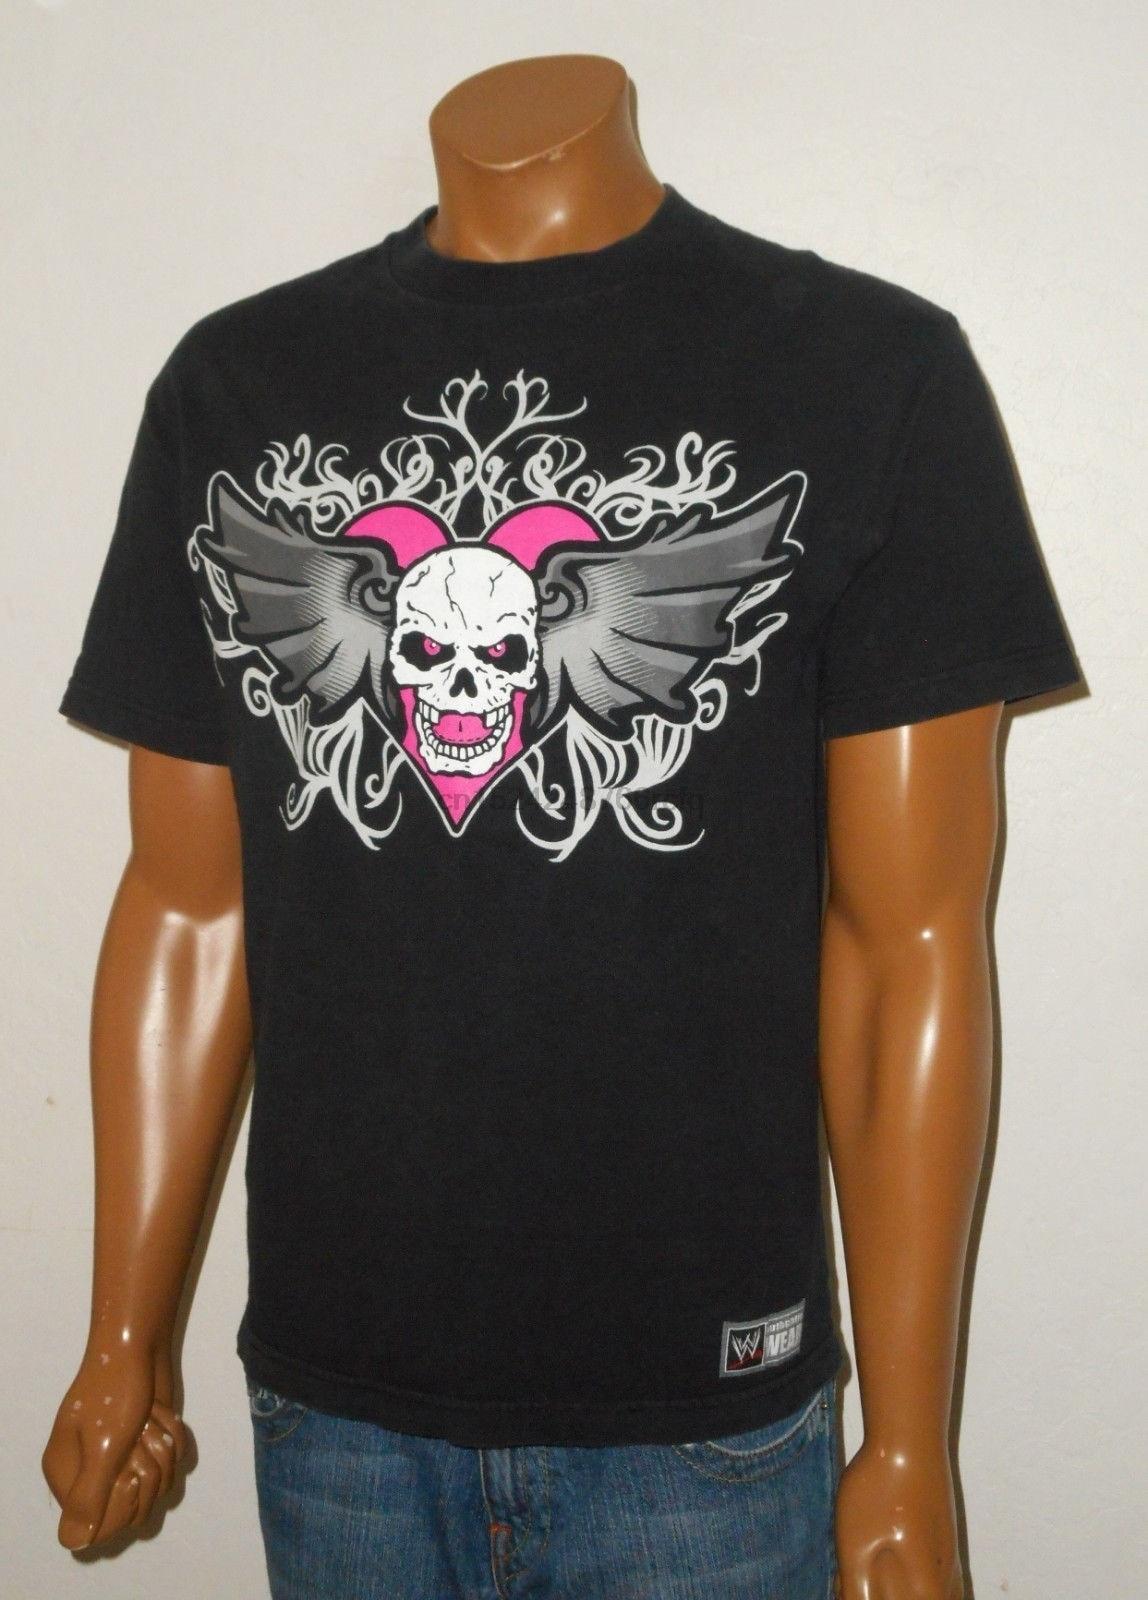 BRET The HITMAN HART WWF Wrestling Fashion Casual Men T Shirts Loose Short Sleeve Tops Black Size S-3XL(China)